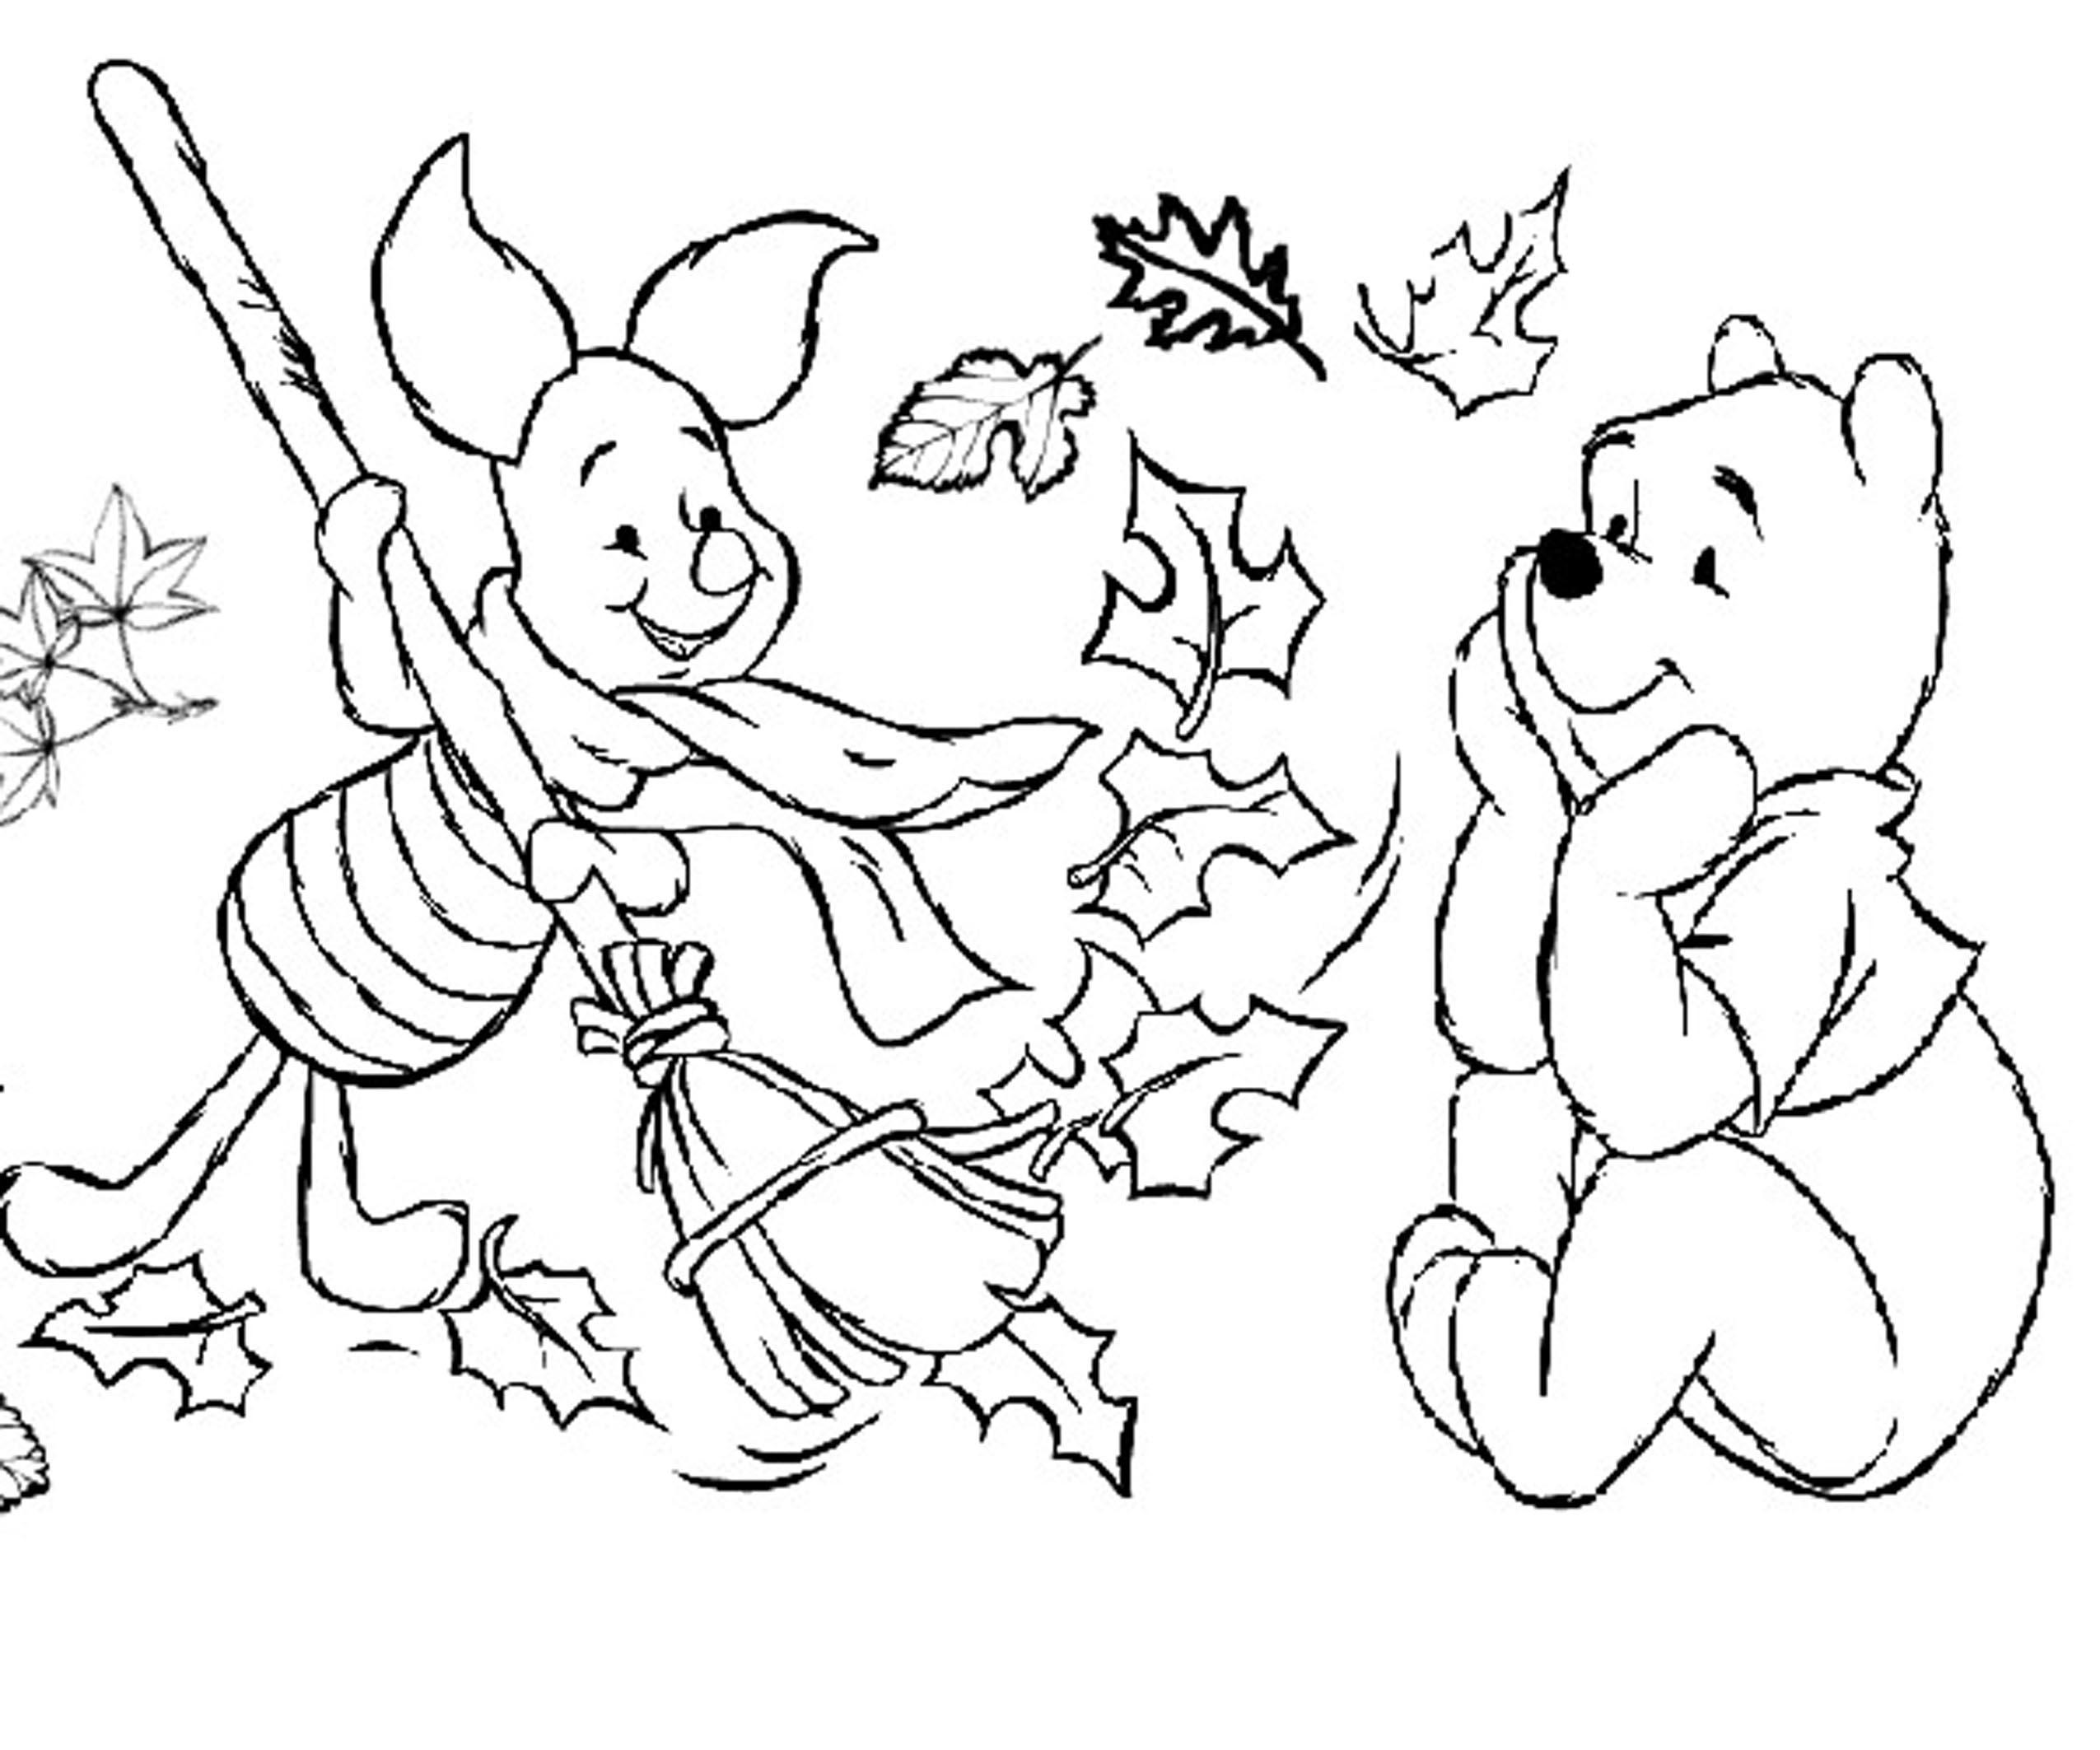 Coloring Pages : Satisfying Printable Bible Coloring Pages Sheets 58 - Free Printable Coloring Pages Fall Season